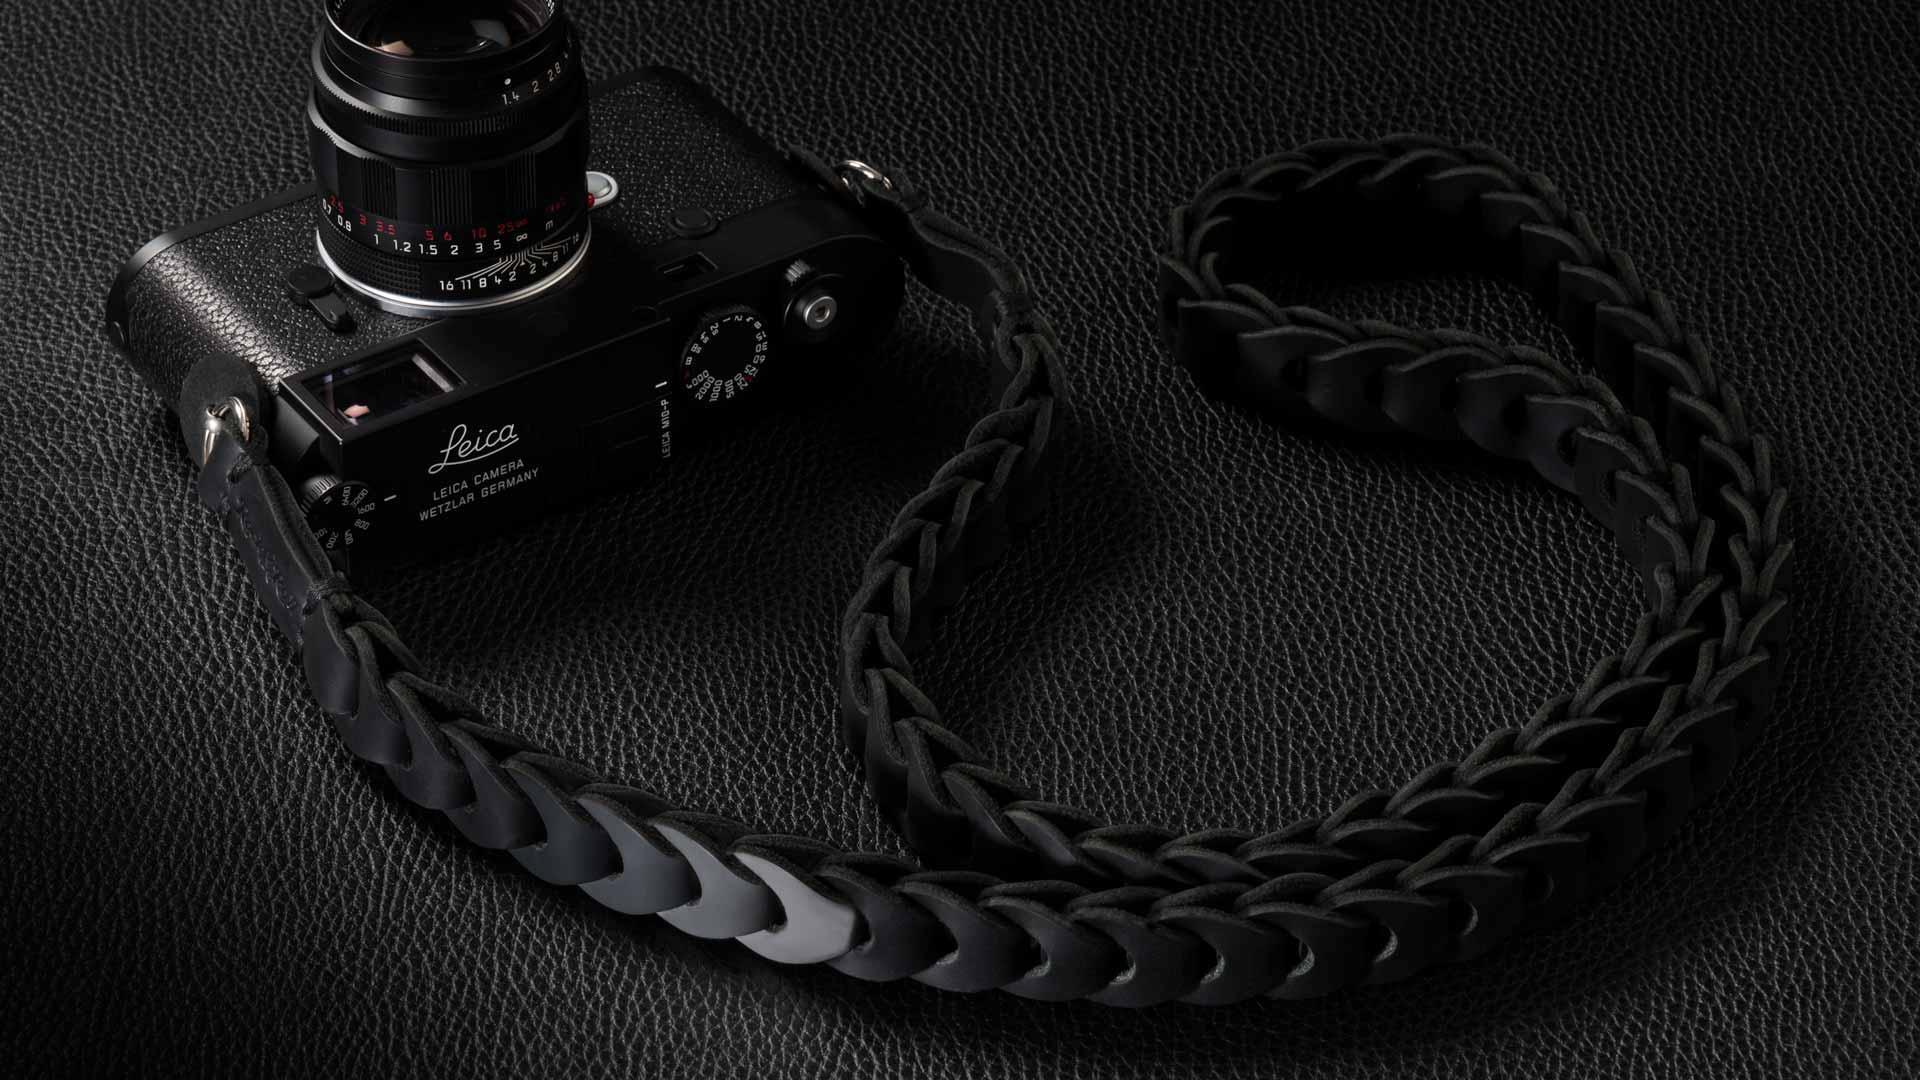 leica m strap, leather camera strap, handmade leather camera strap, vintage camera straps, leica camera strap, handmade camera strap, mirrorless camera strap